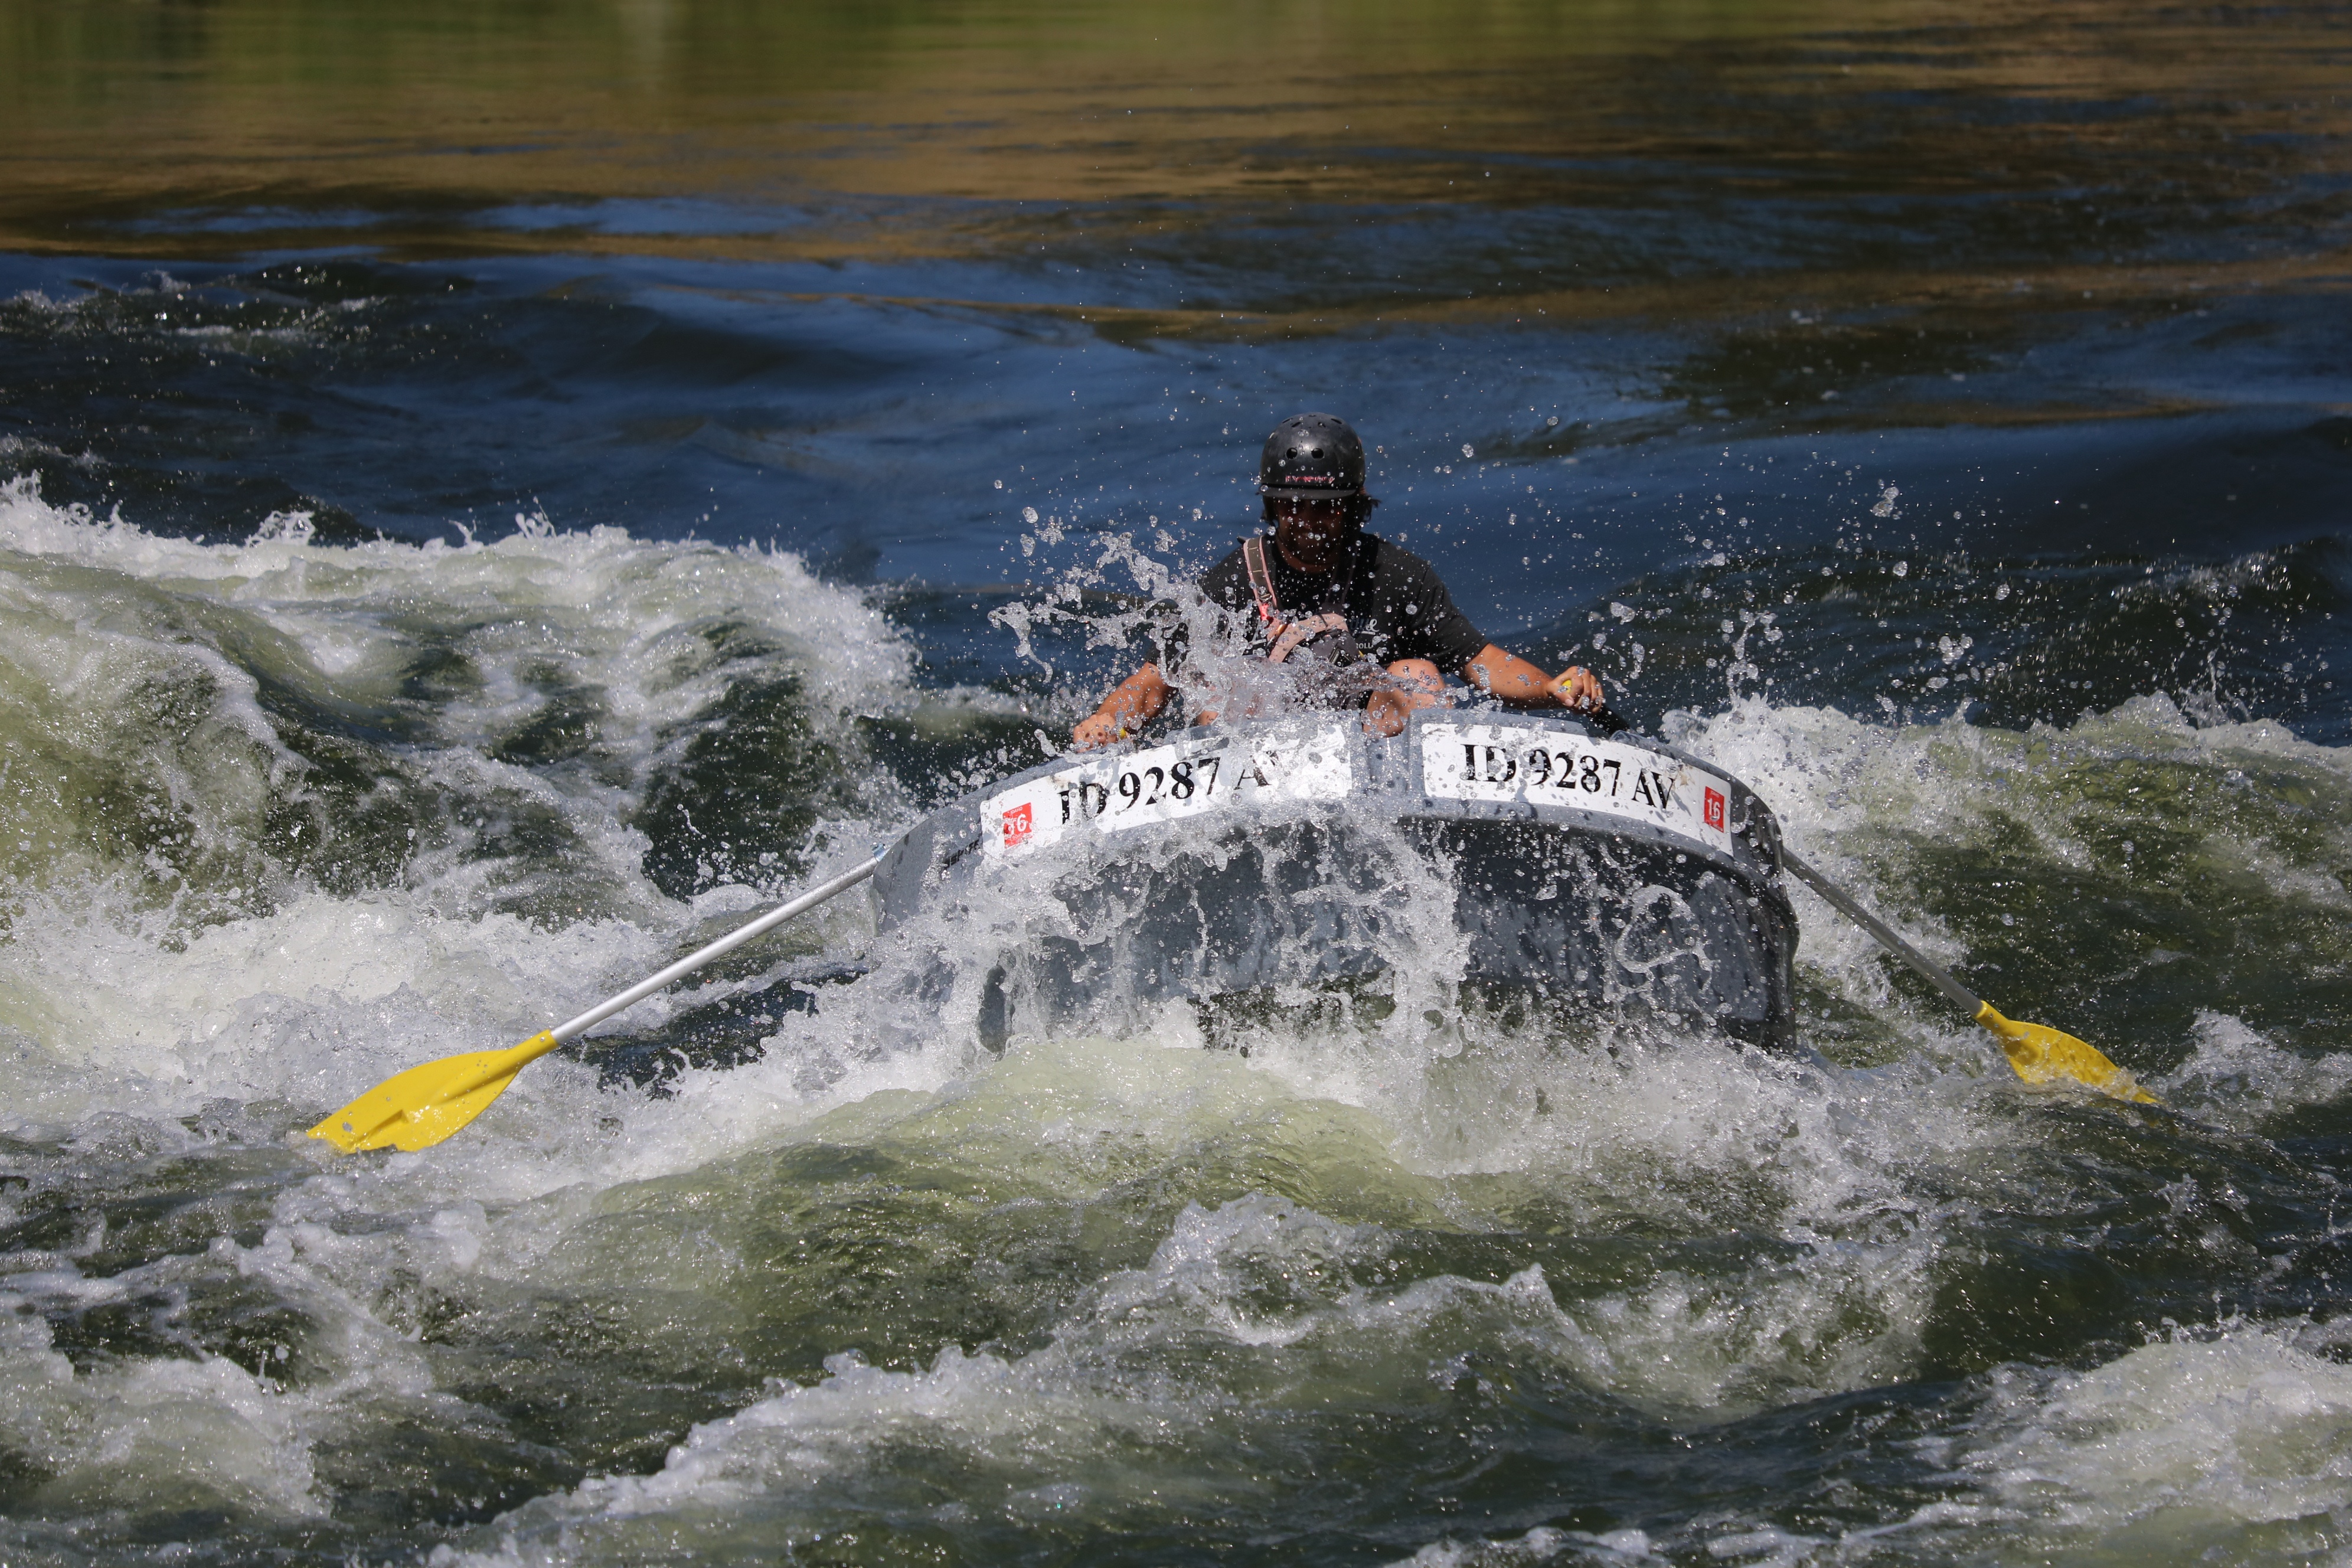 ultraskiff class 3 rapids